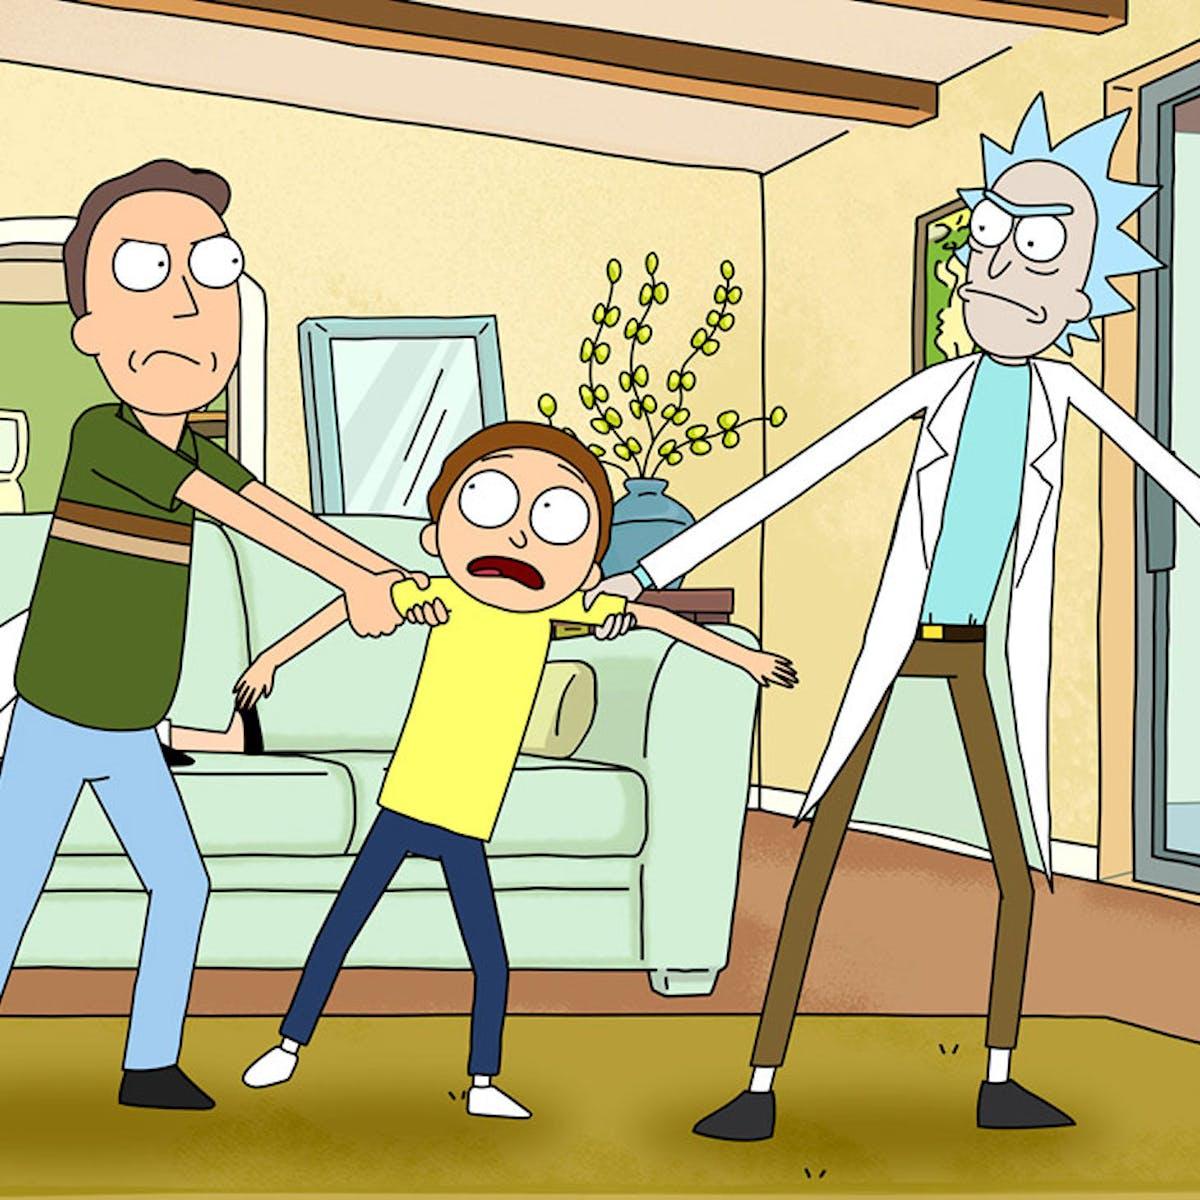 Rick and Morty' Season 5: Dan Harmon Trolls Fans With Very